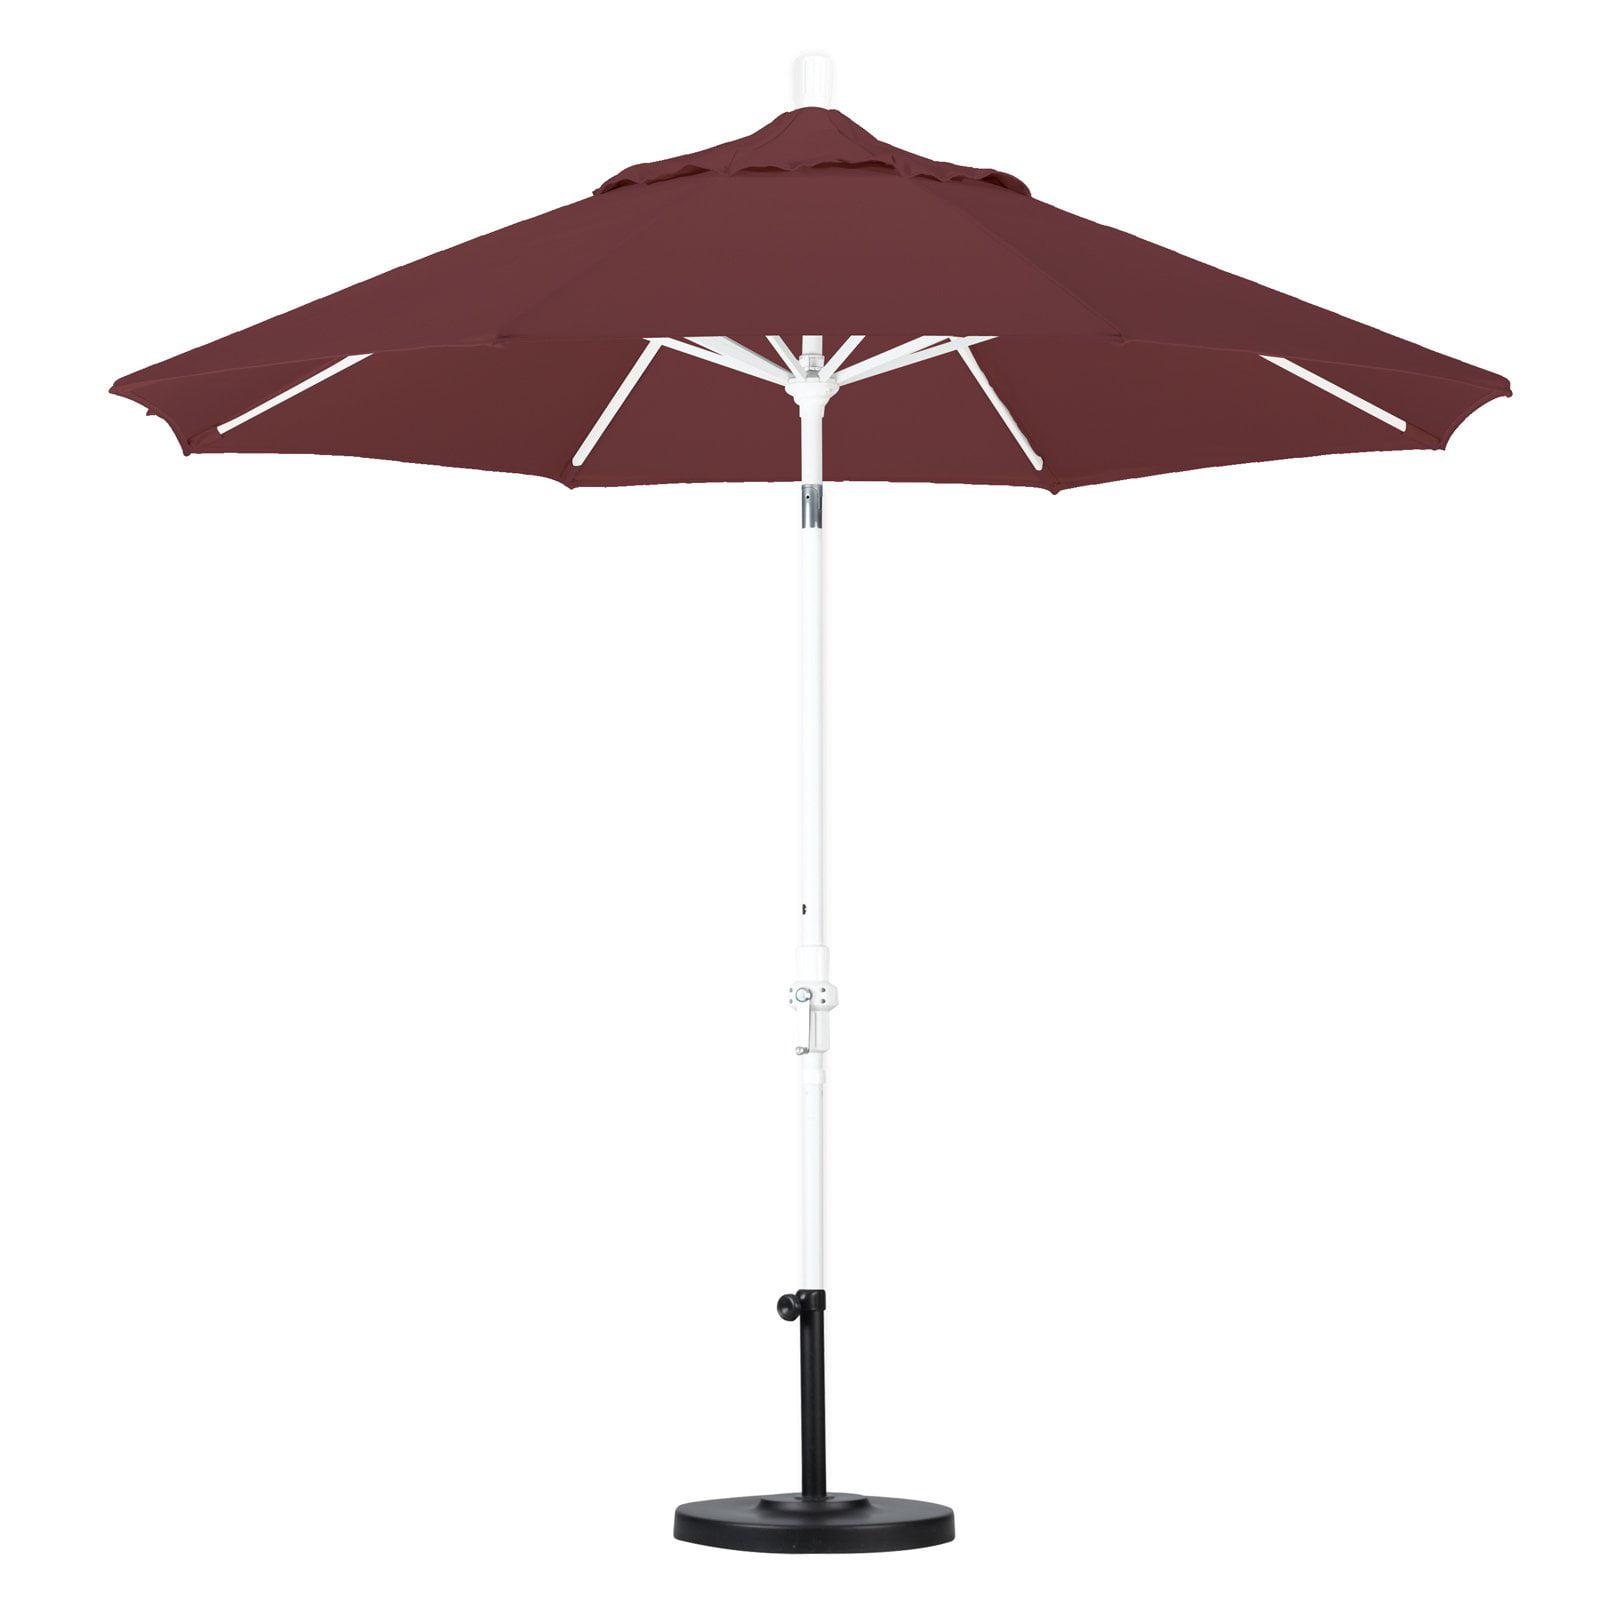 California Umbrella 7.5' Market Patio Umbrella with Collar Tilt in White